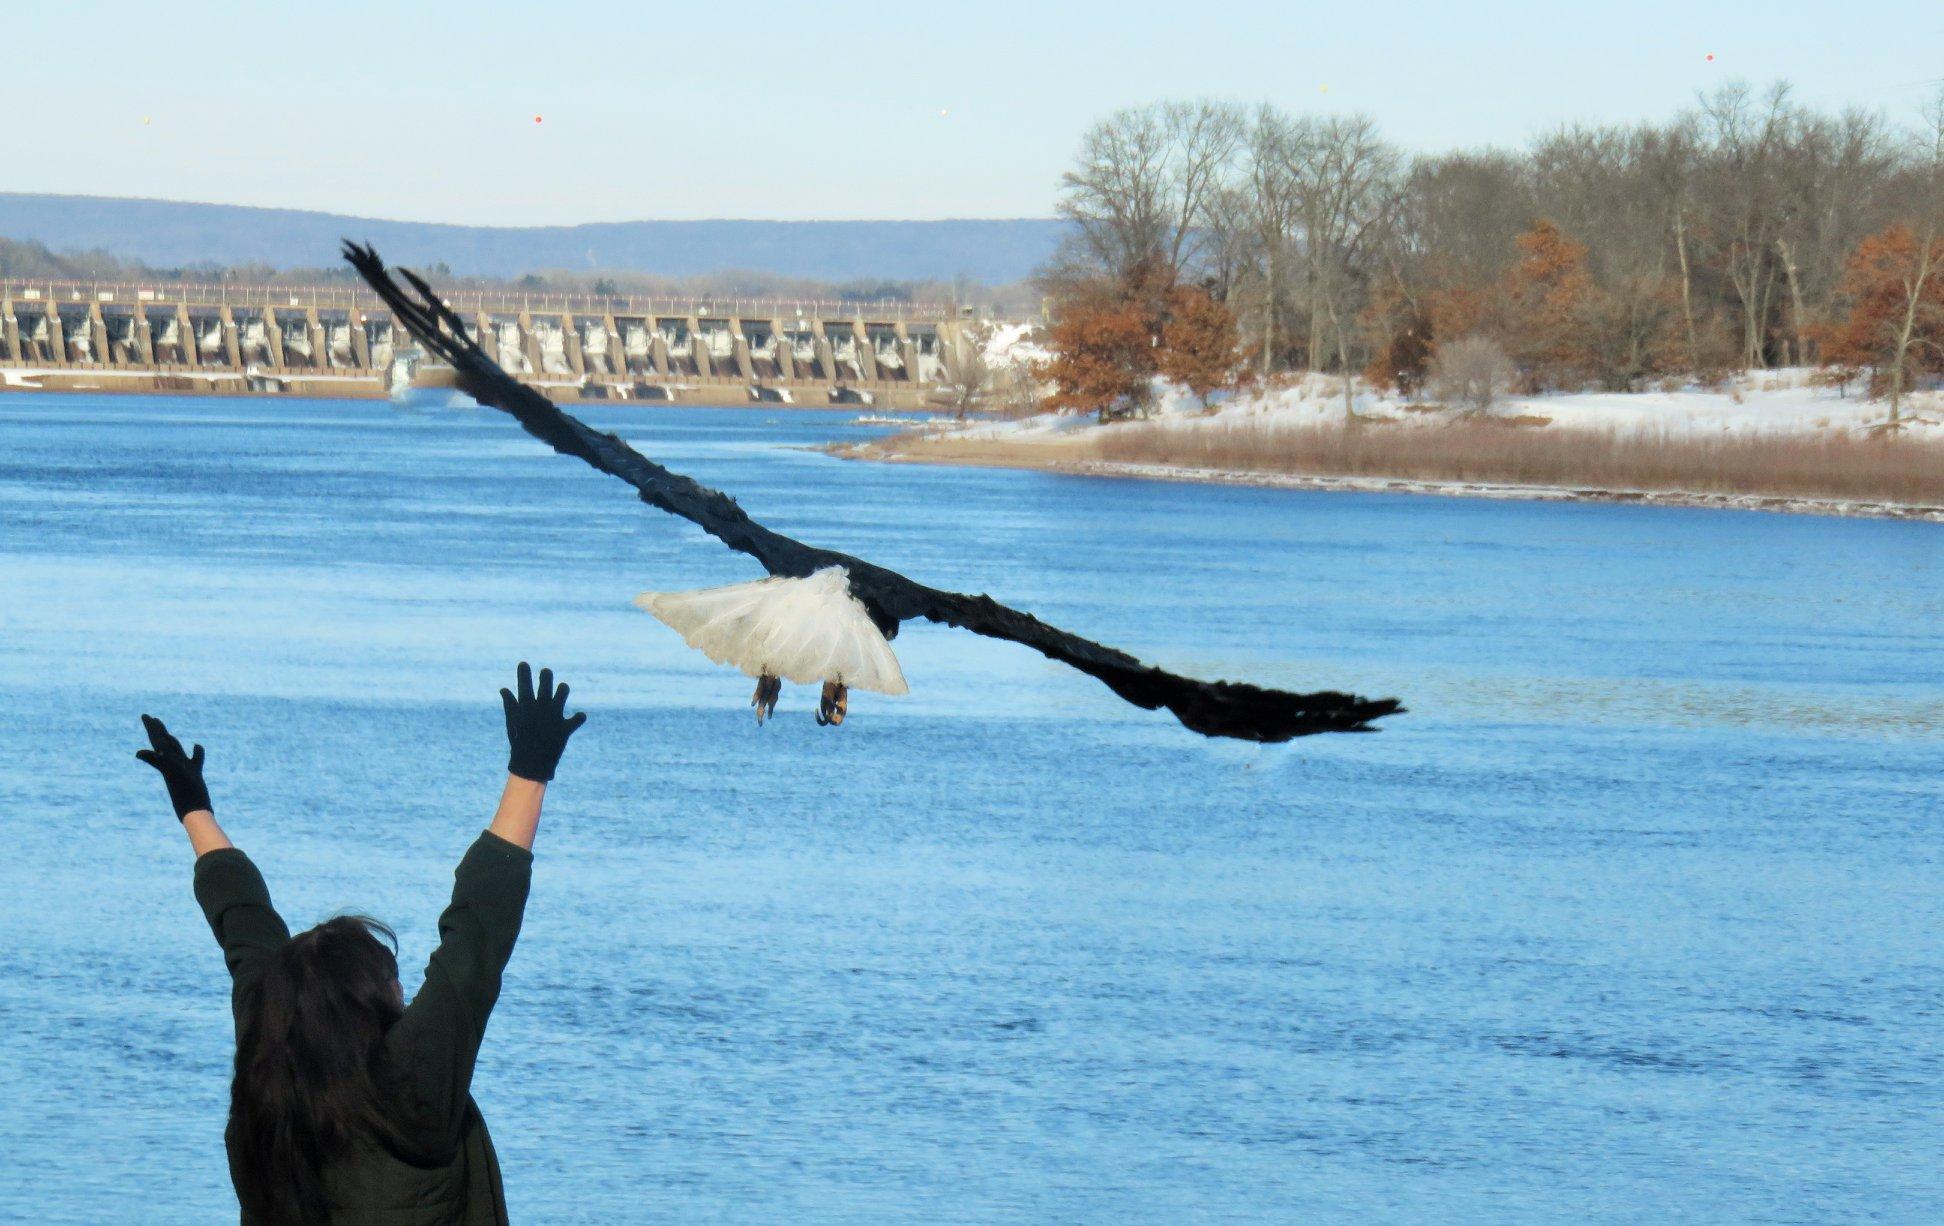 Eagle release in Sauk/Prairie.